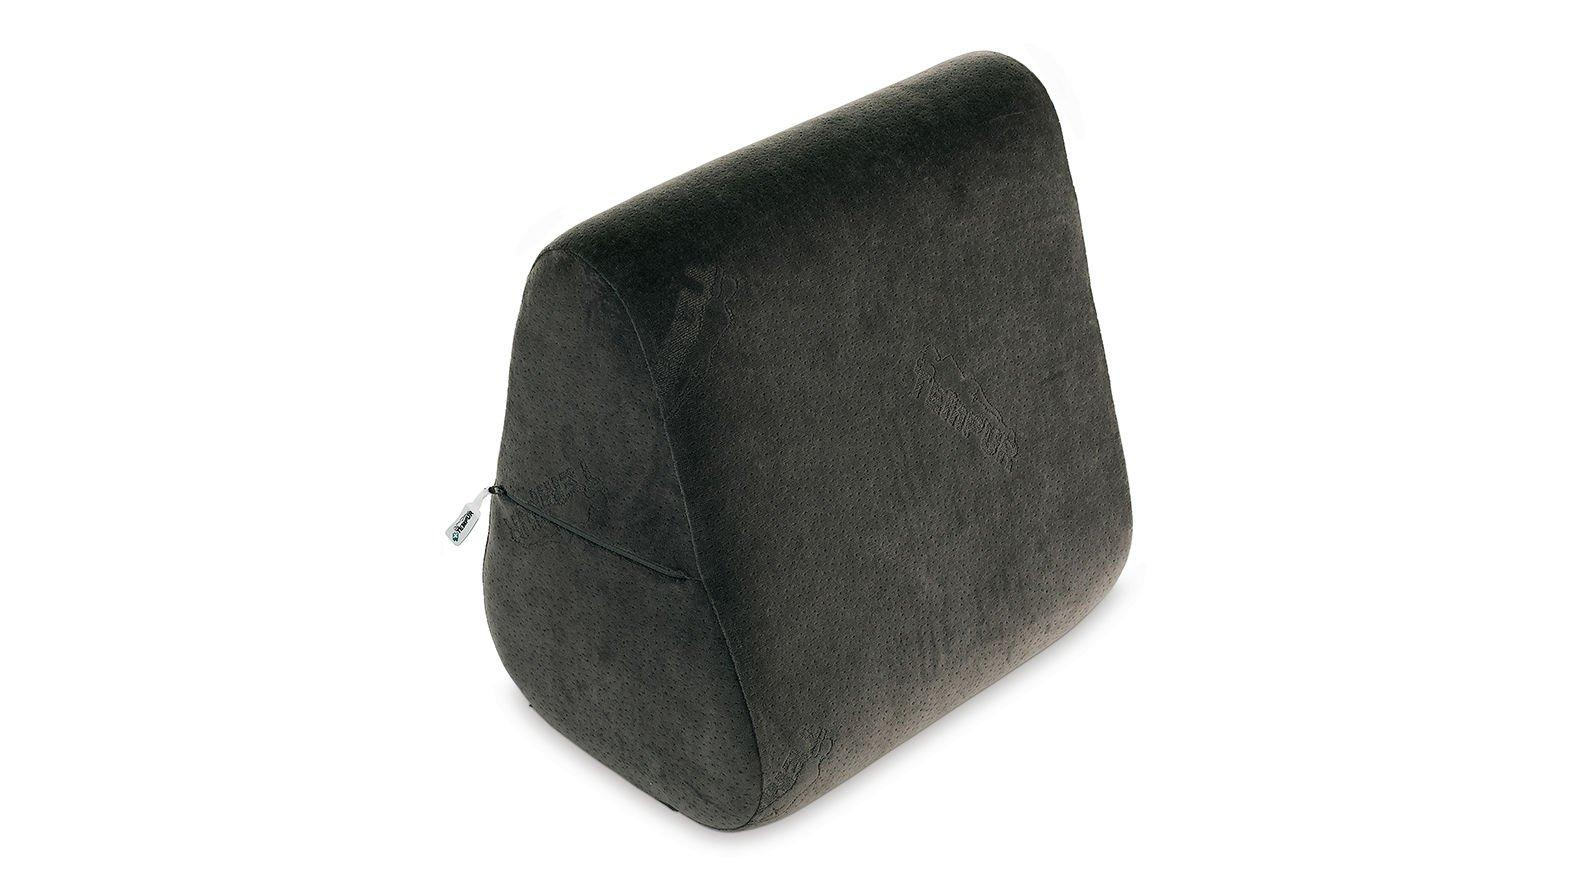 tempur bed wedge